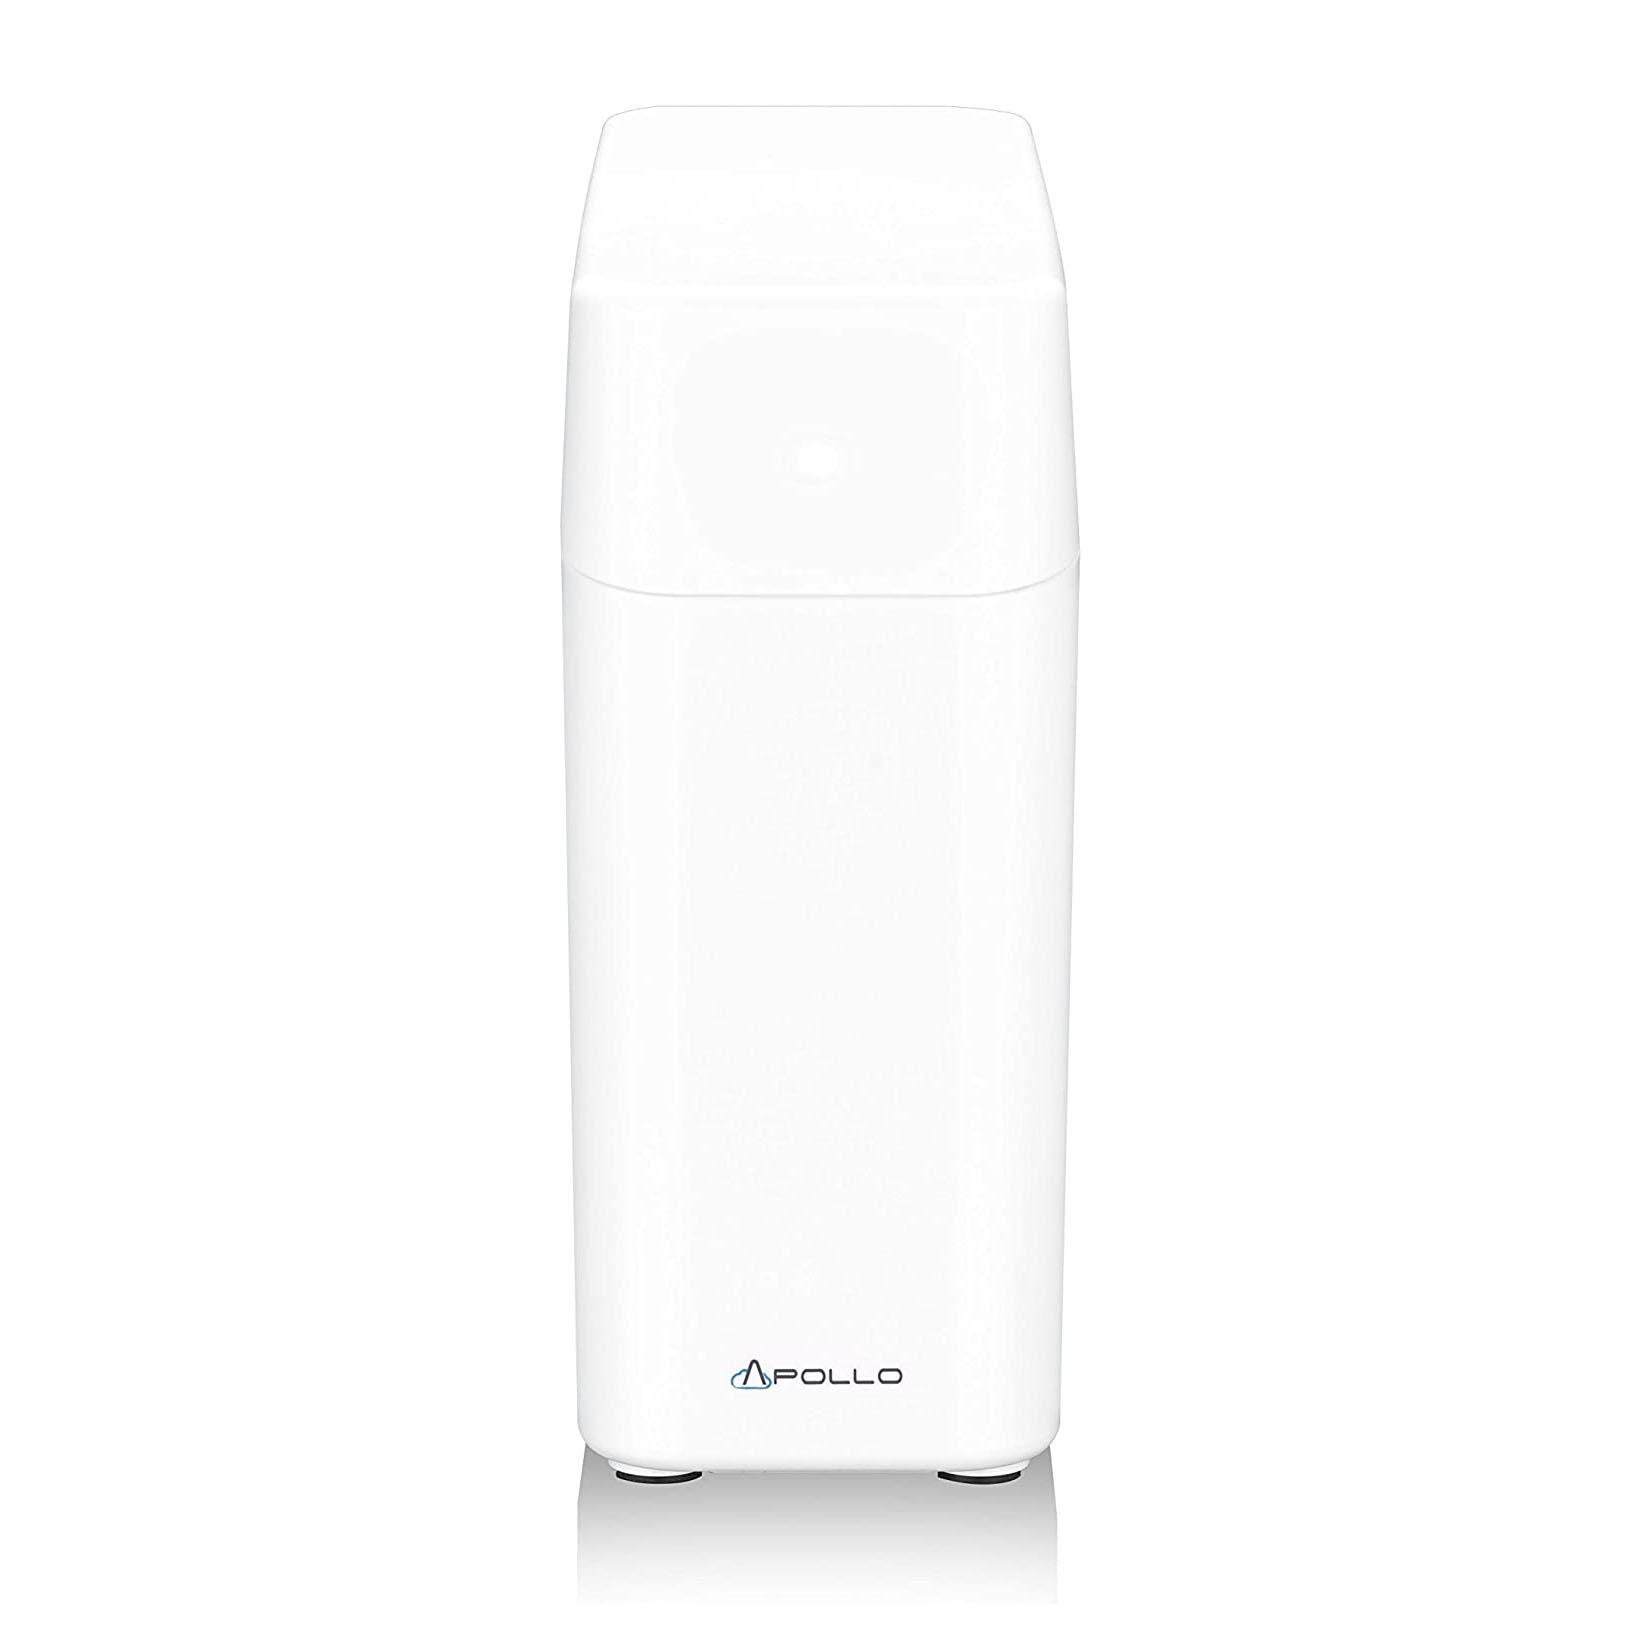 Promise Apollo Cloud 2TB Personal Cloud Storage (HDD Included) - Hàng chính hãng